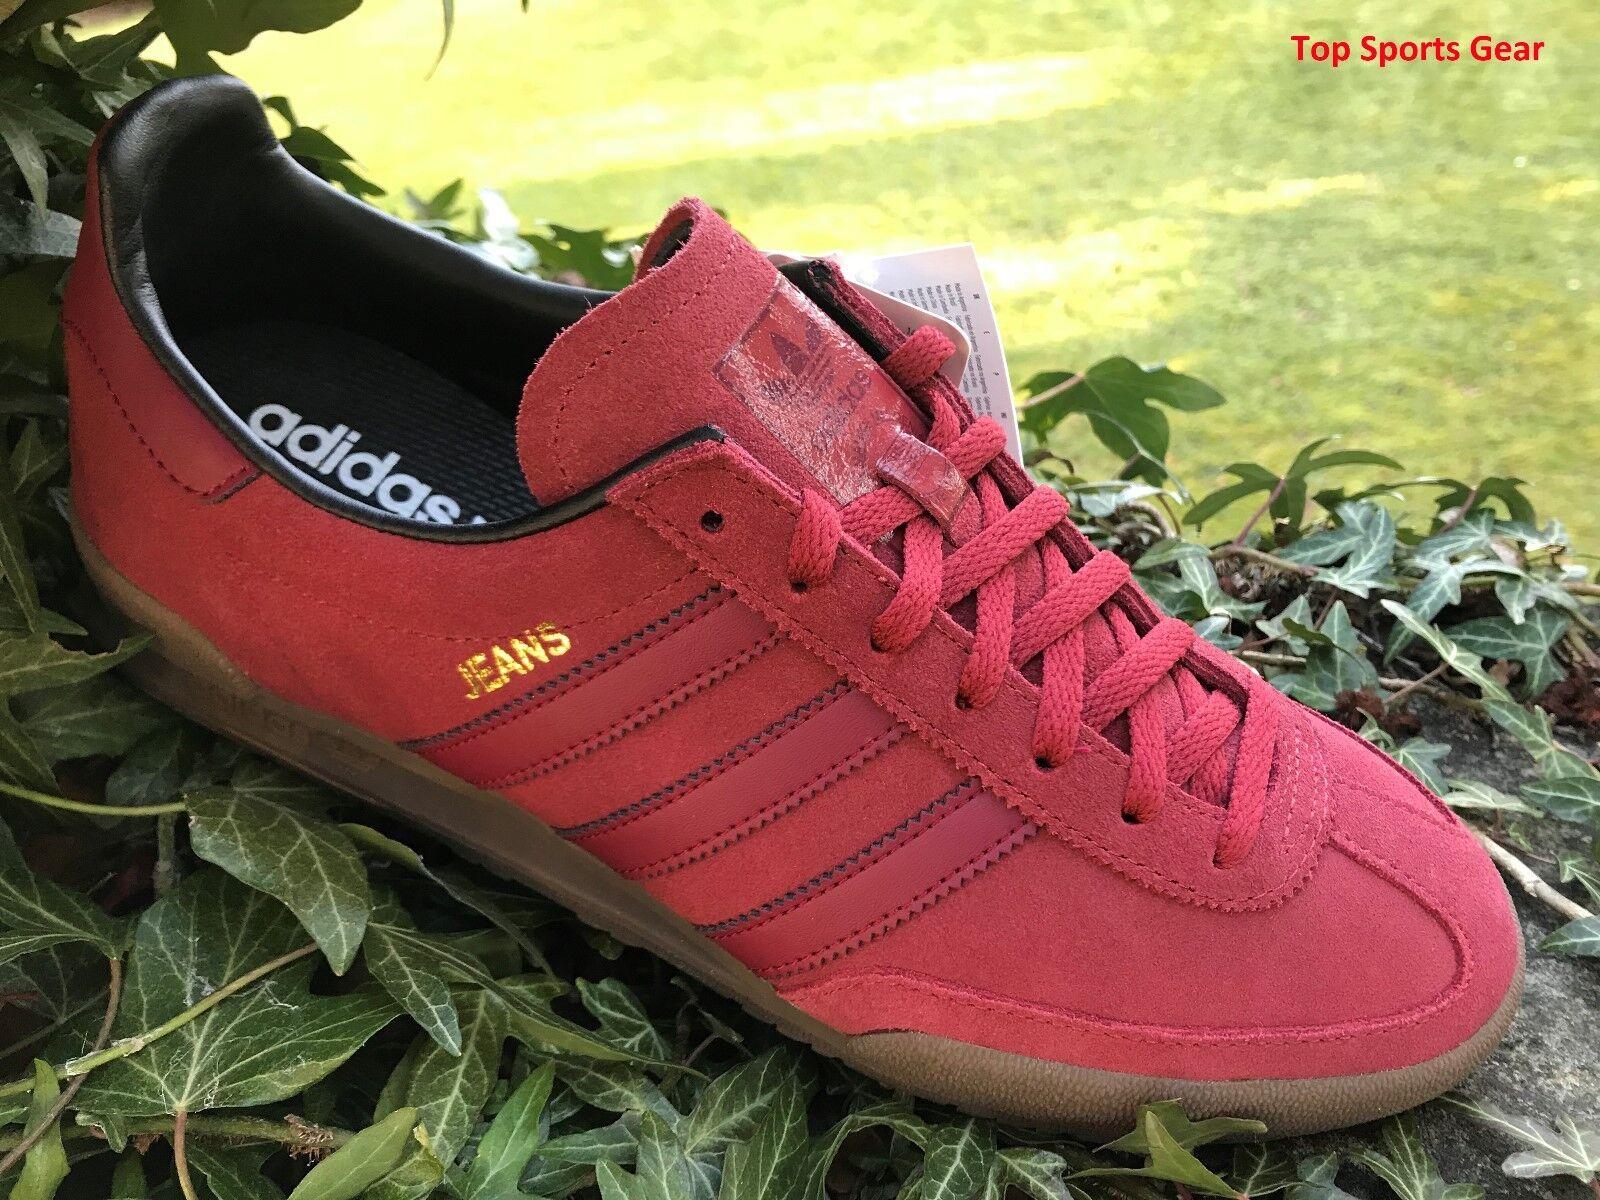 Adidas Originals Hombres Jeans Moda Entrenadores Rojo BNIBWT tamaños UK 10.5 EU45.3